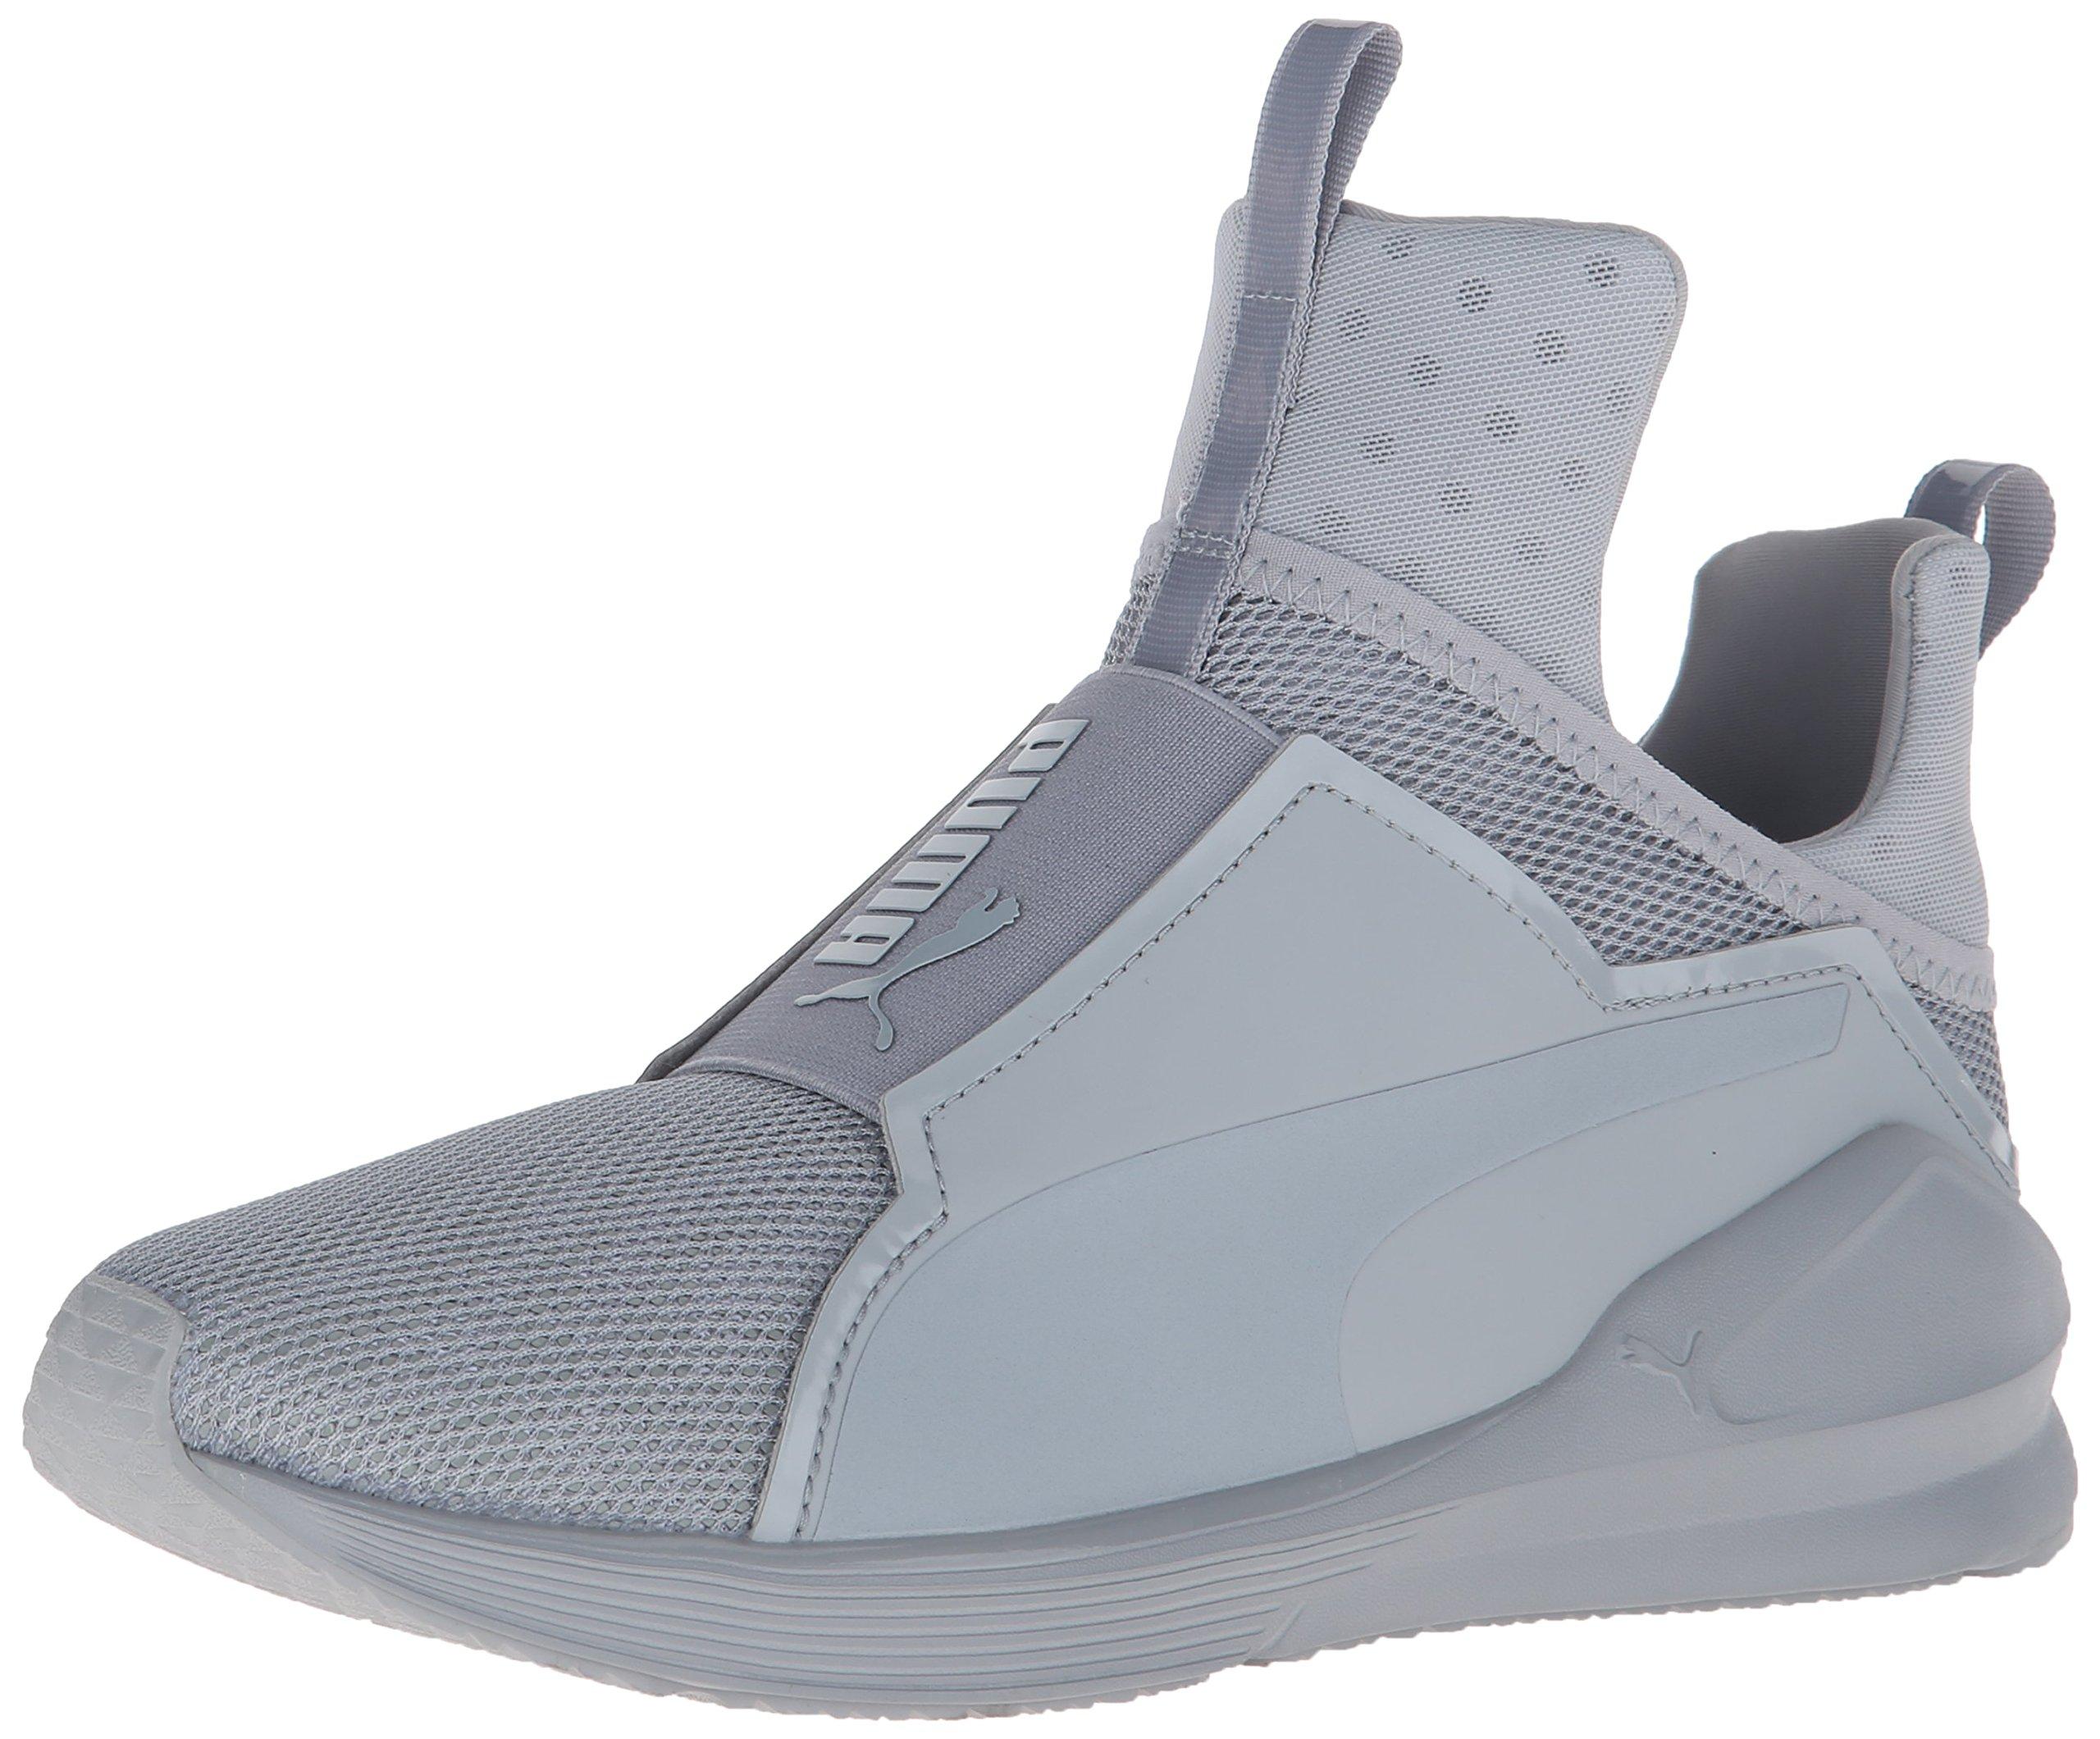 PUMA Women's Fierce Shine Cross-Trainer Shoe, Quarry/White, 5.5 M US